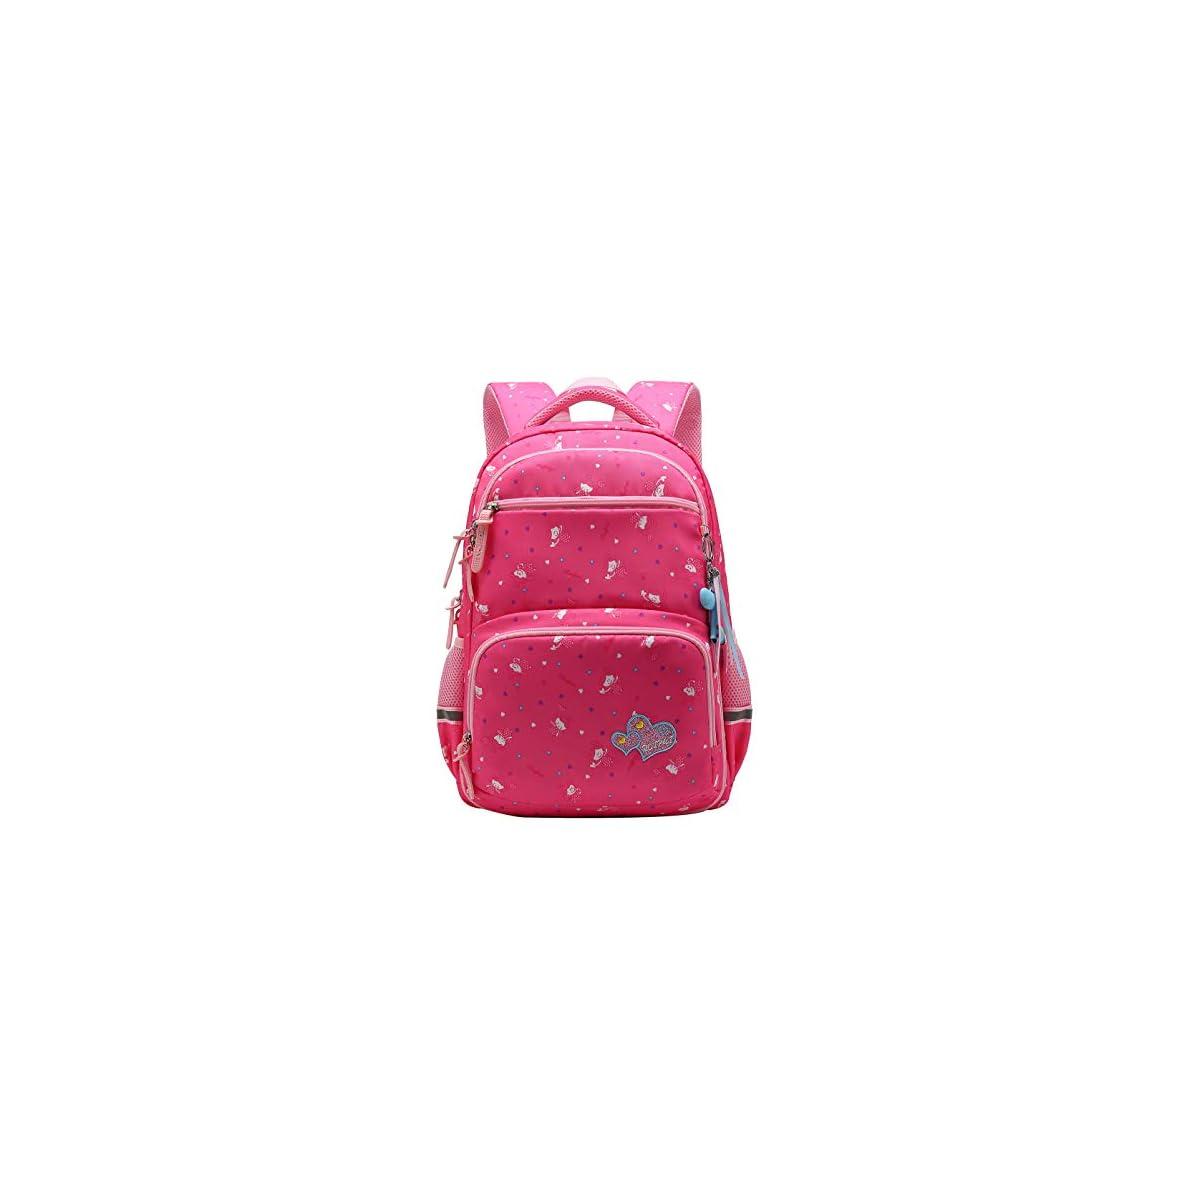 41z7jOgvEIL. SS1200  - SellerFun UKXB106 - Mochila Infantil Niños, 22 L Style B Rose (Rojo) - UKXB426A1